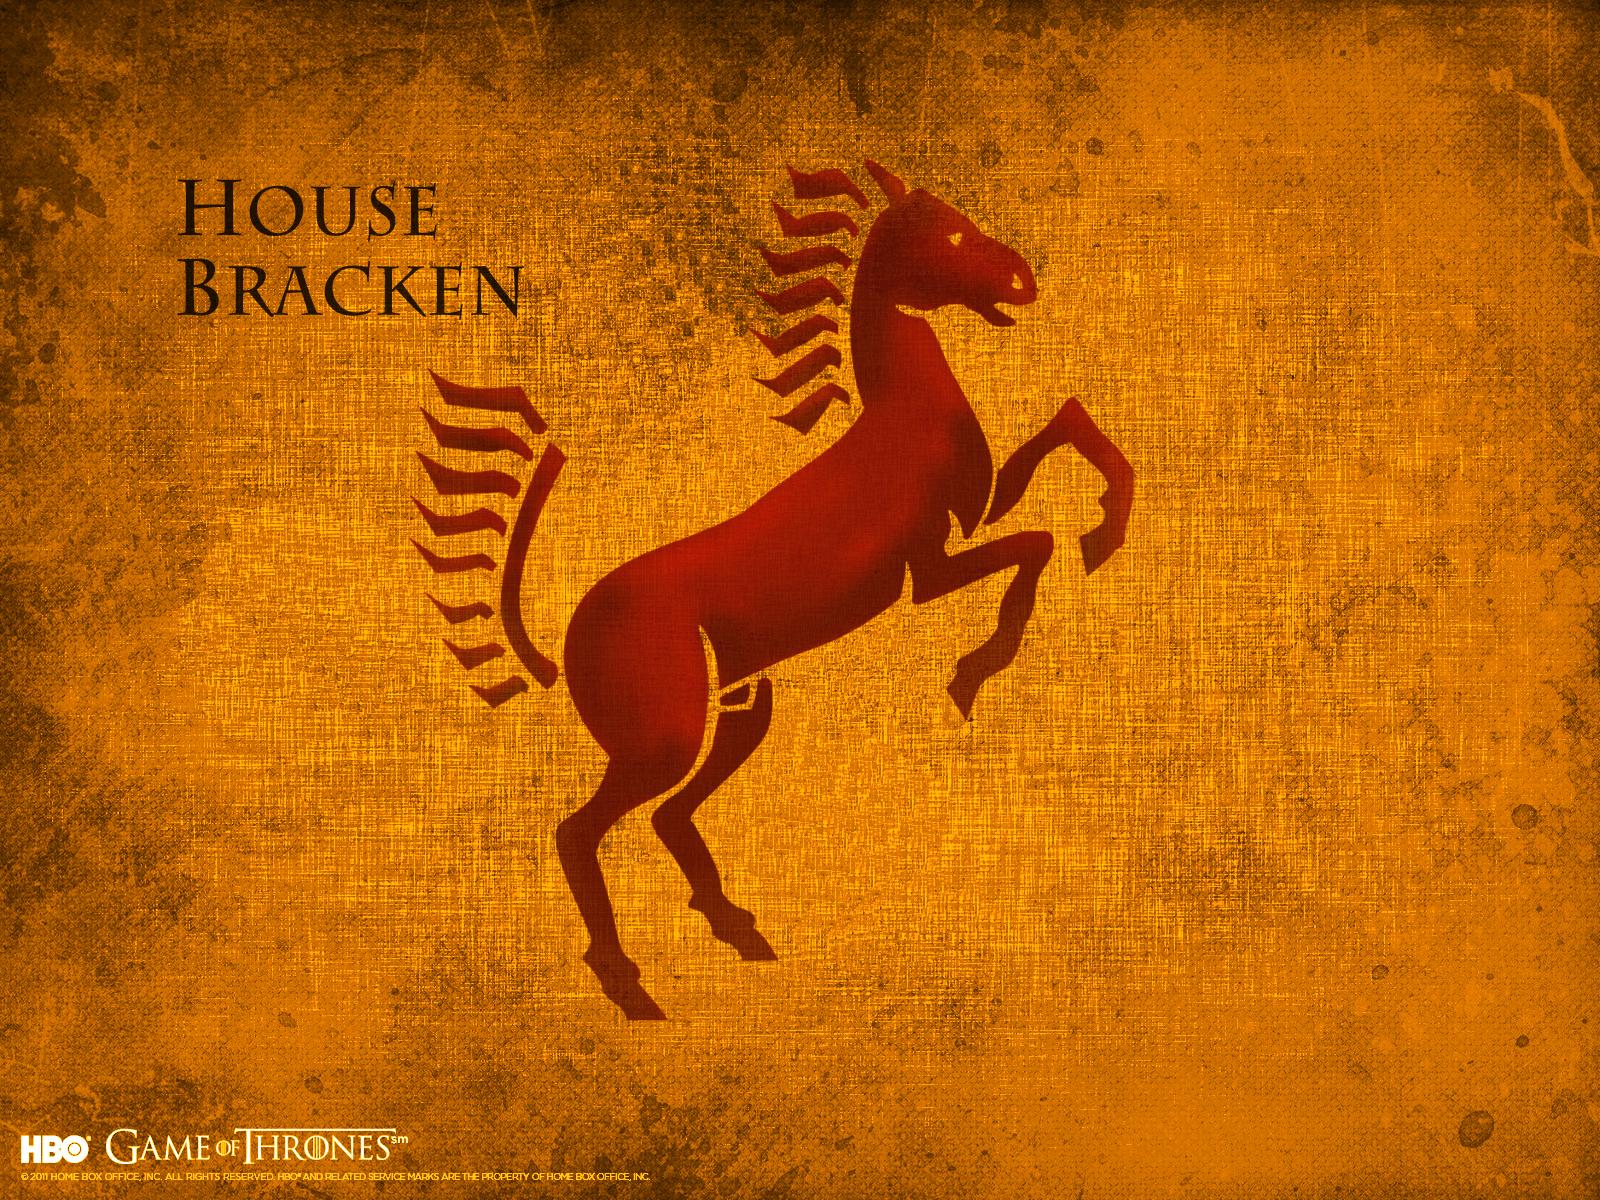 House Bracken